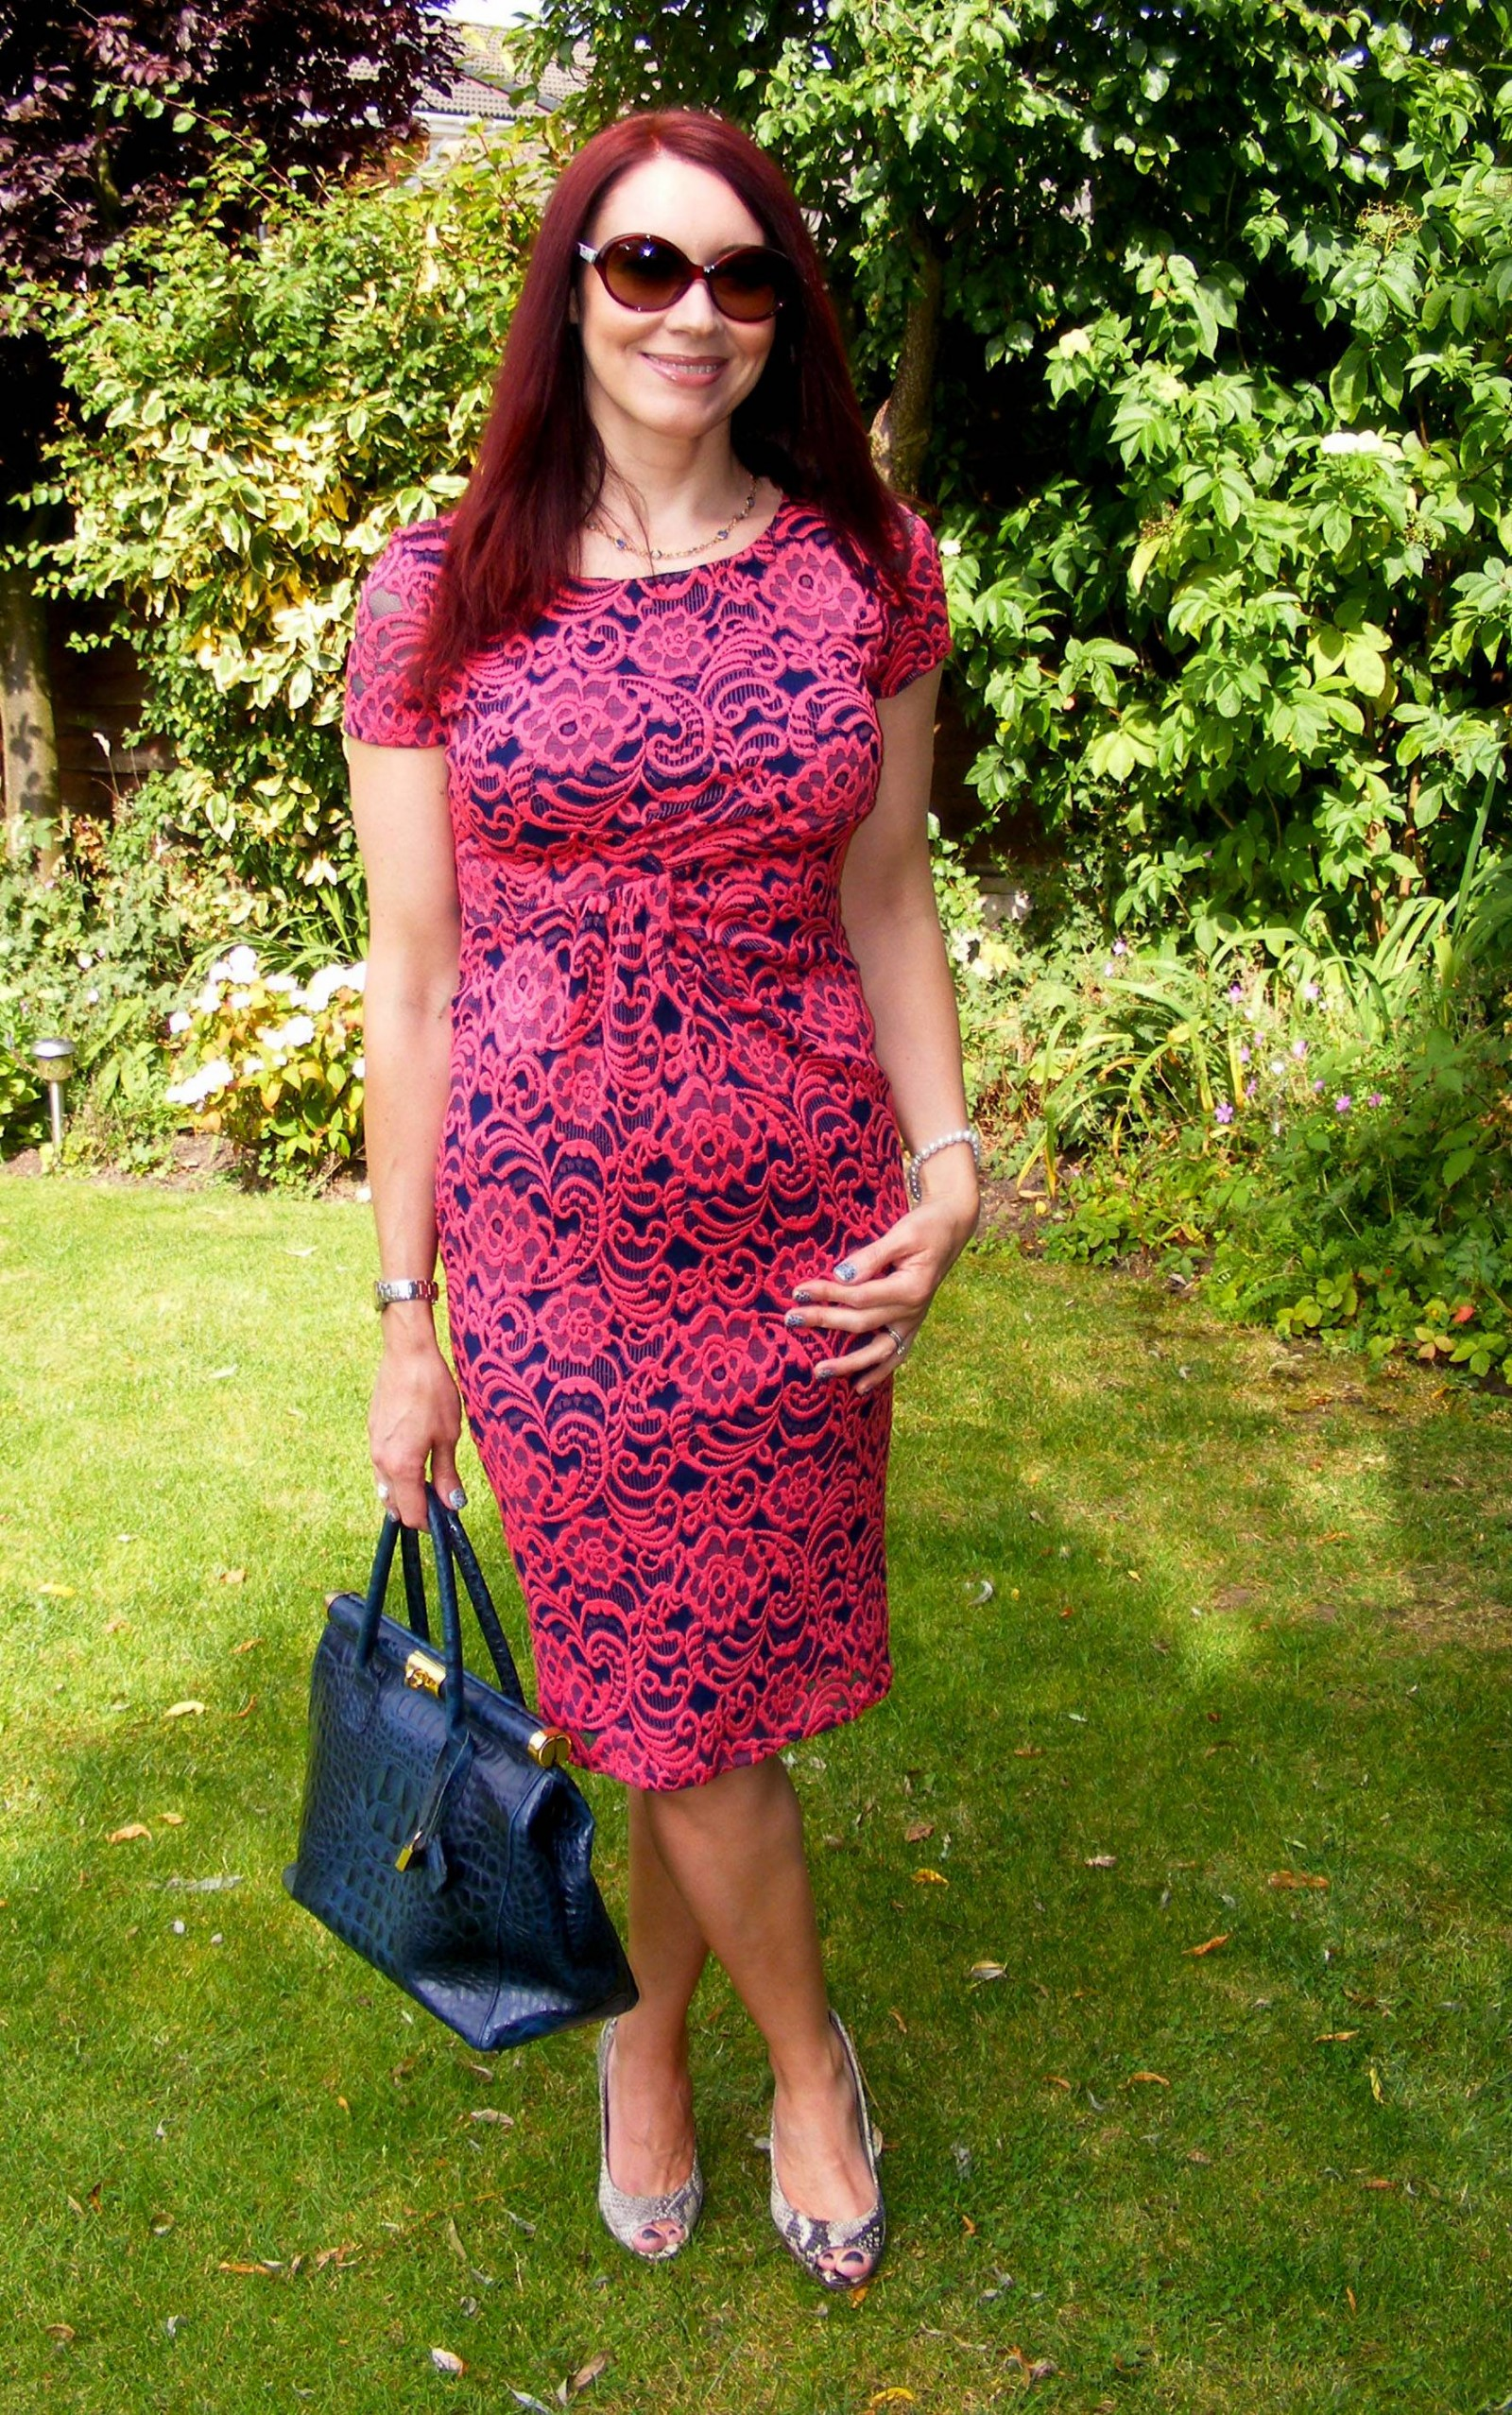 M&S lace dress